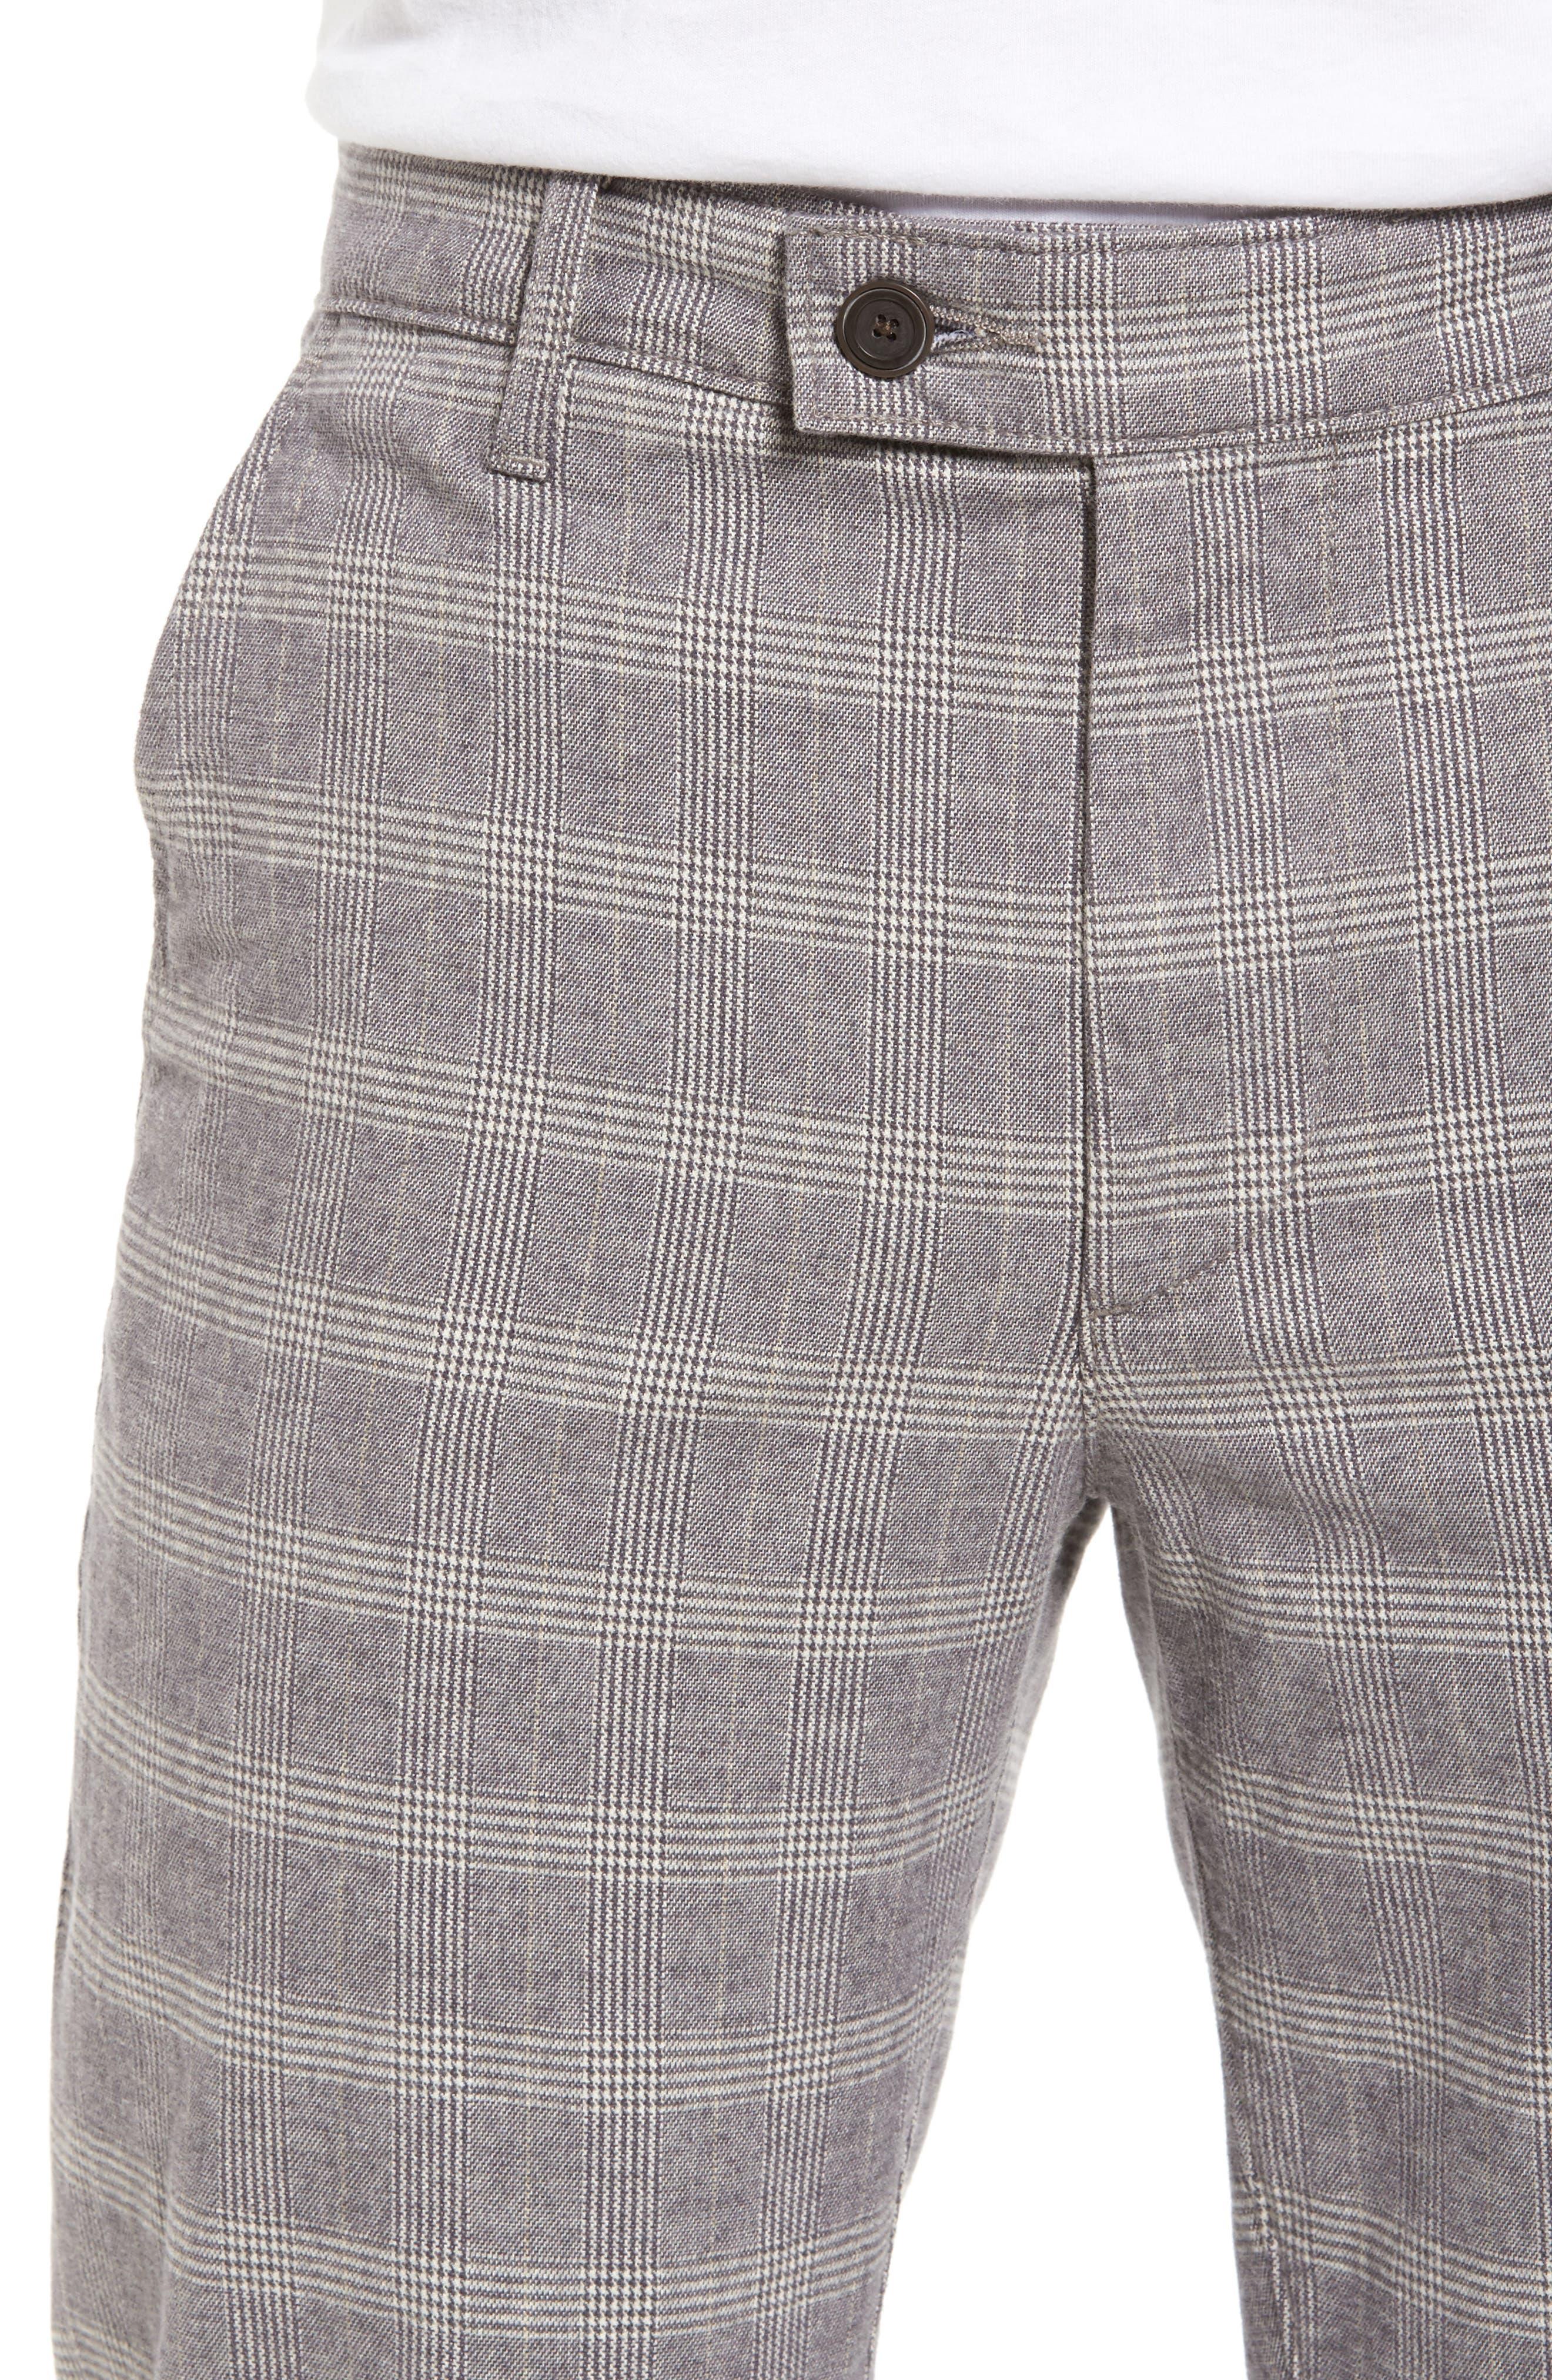 Marshall Slim Fit Pants,                             Alternate thumbnail 4, color,                             250